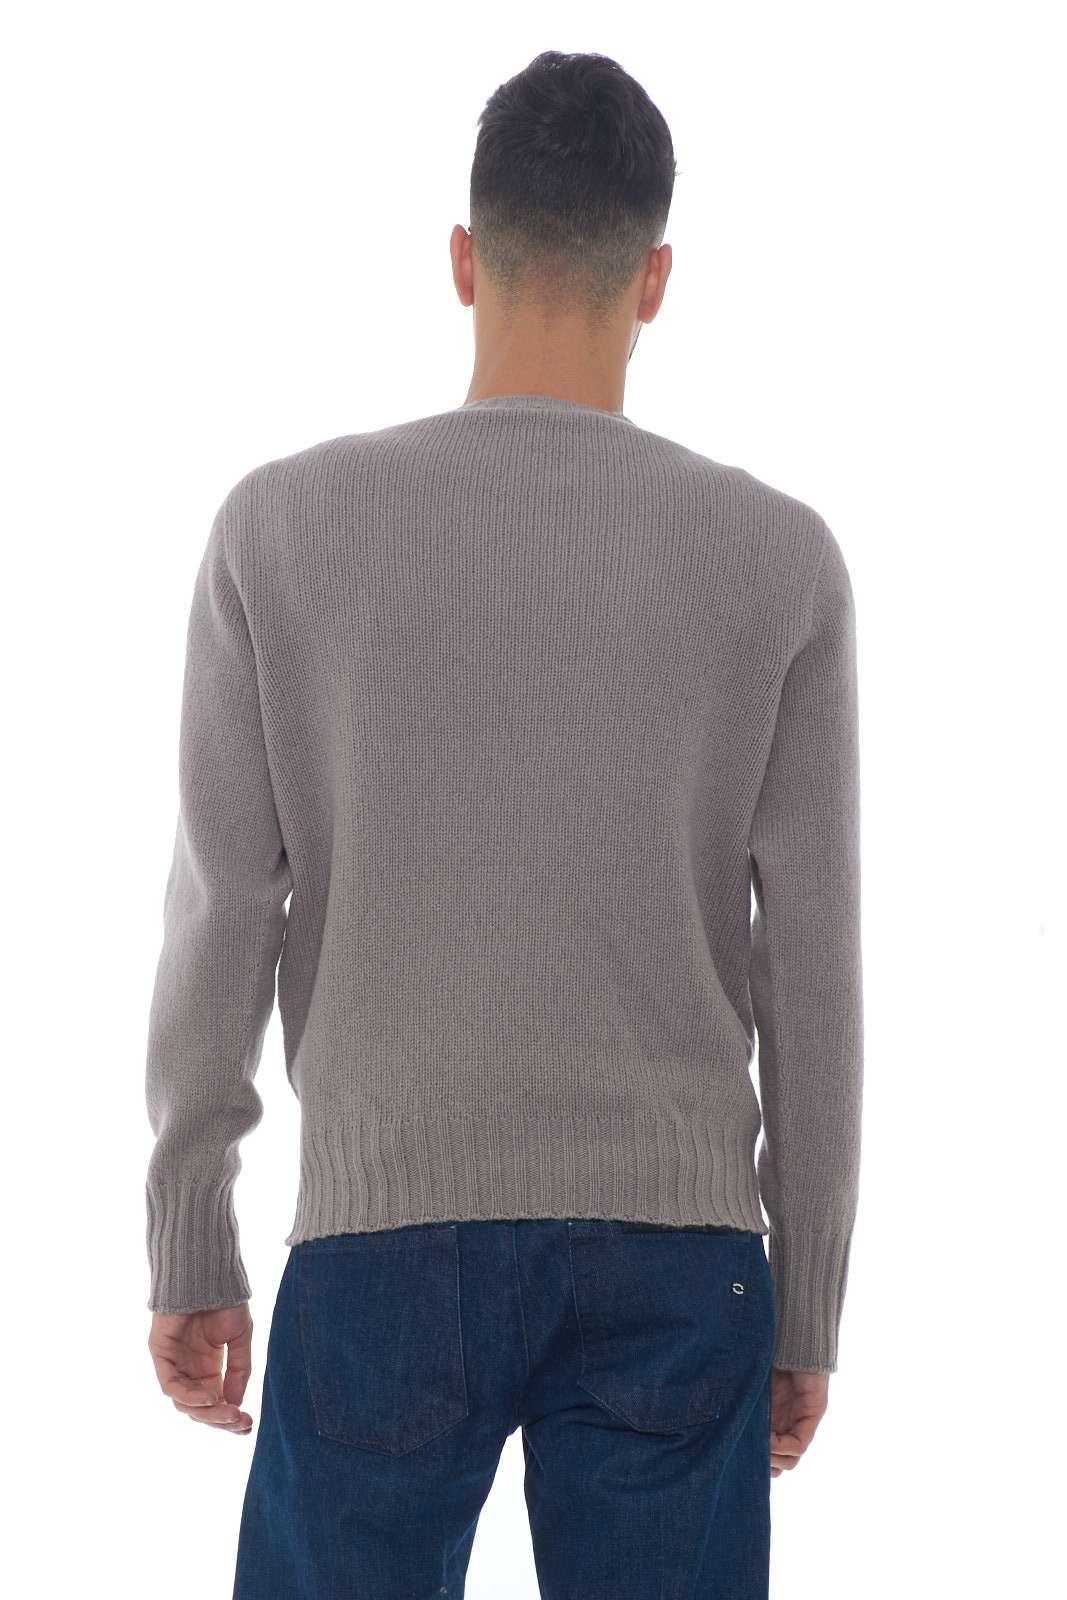 https://www.parmax.com/media/catalog/product/a/i/AI-outlet_parmax-maglia-uomo-Acquapura-001-C.jpg